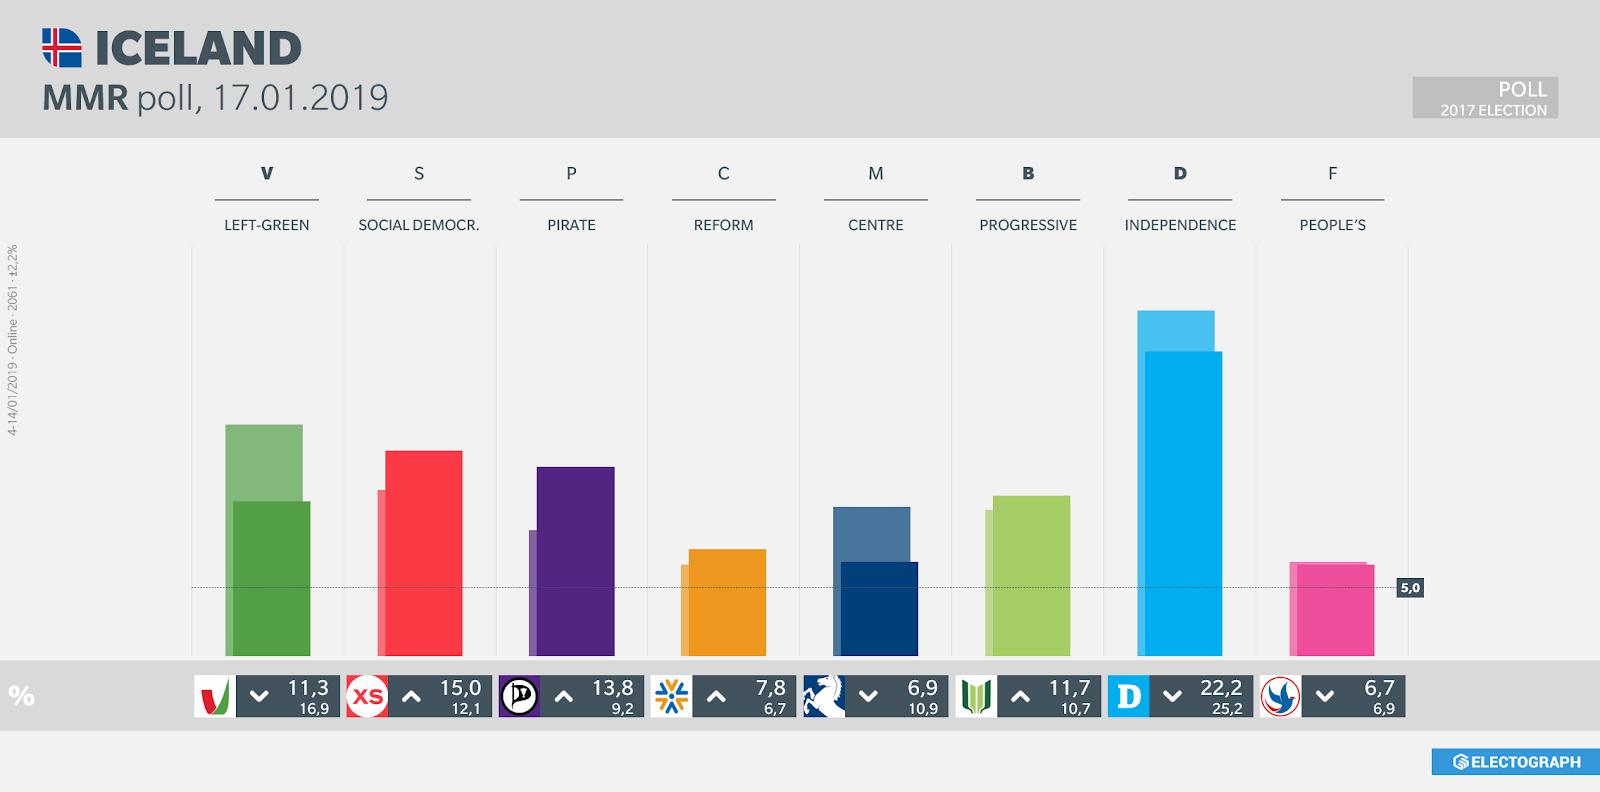 ICELAND: MMR poll chart, 17 January 2019